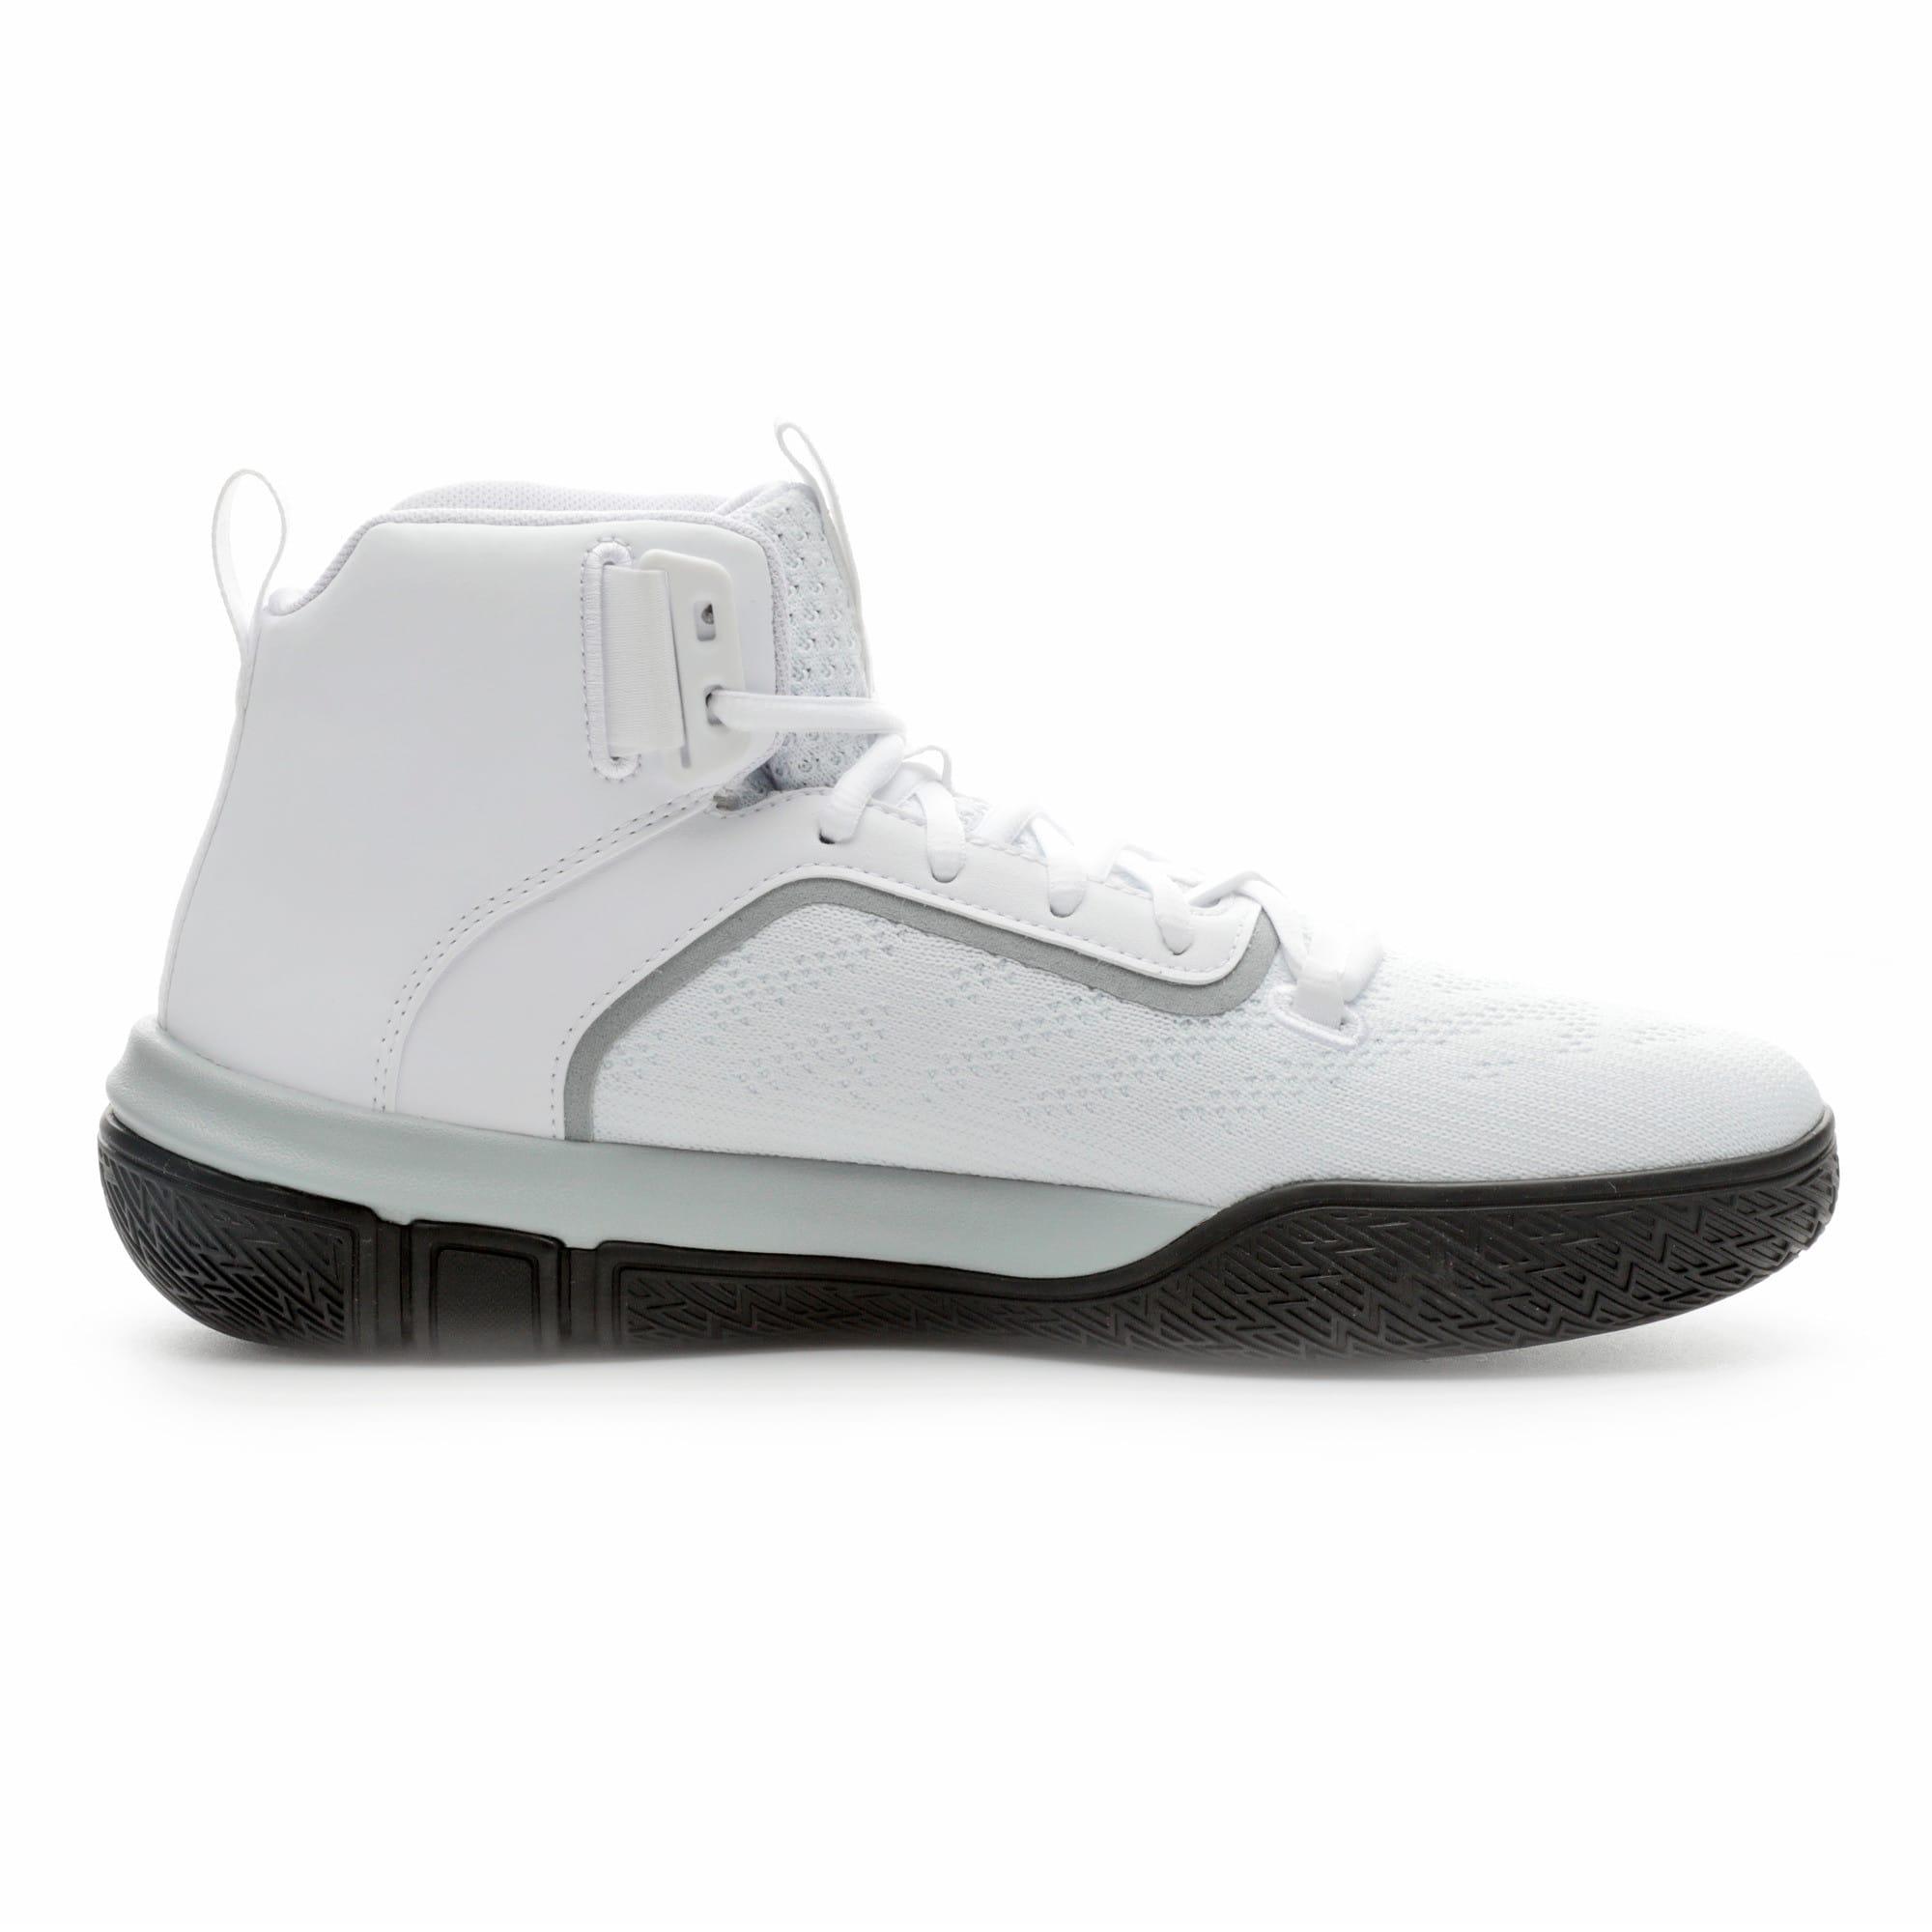 Thumbnail 5 of Legacy '68 Basketball Shoes, Puma Black-Puma White, medium-IND